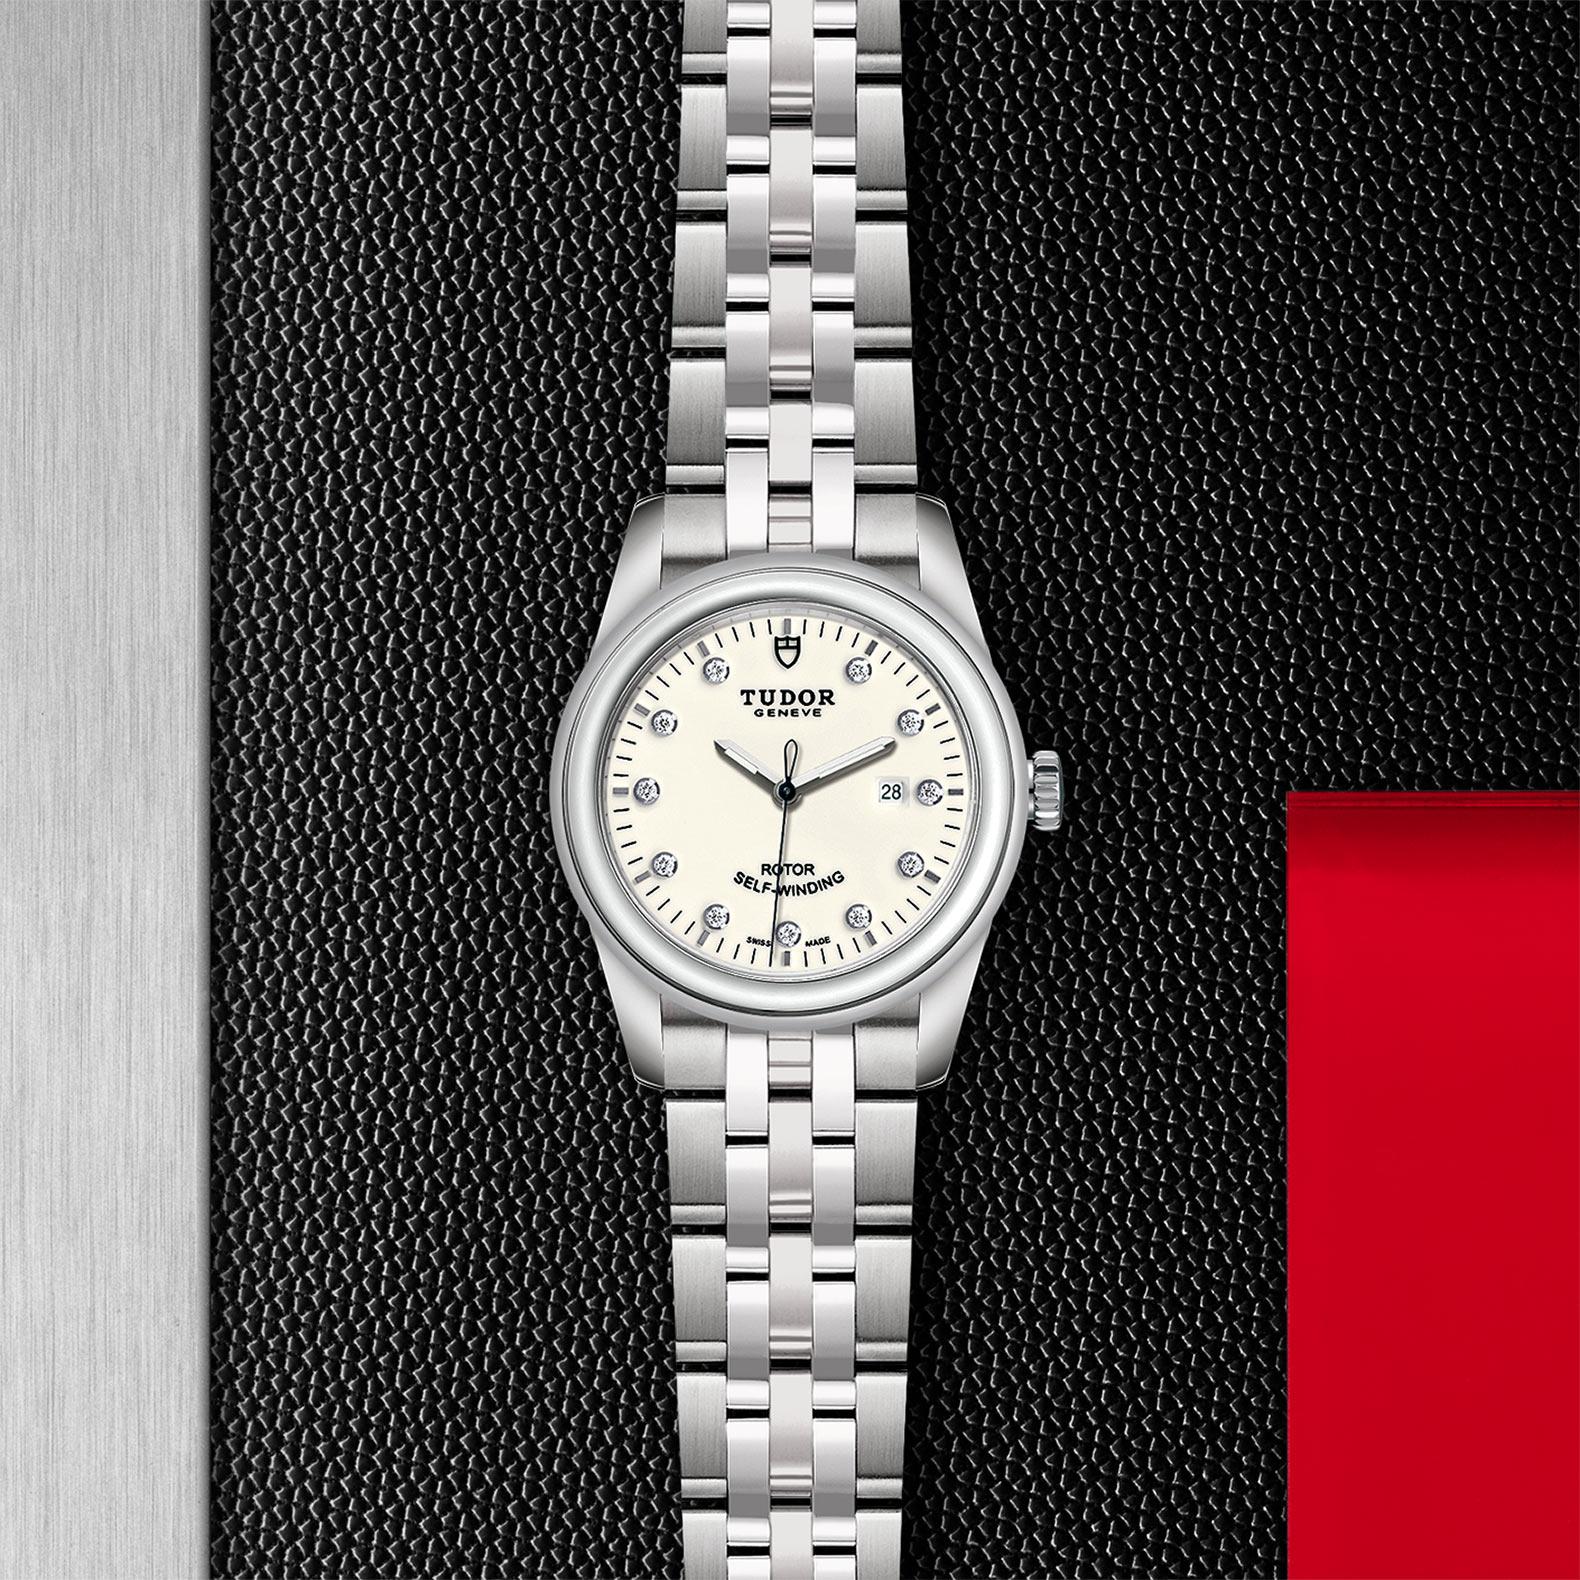 TUDOR Glamour Date - M53000-0080